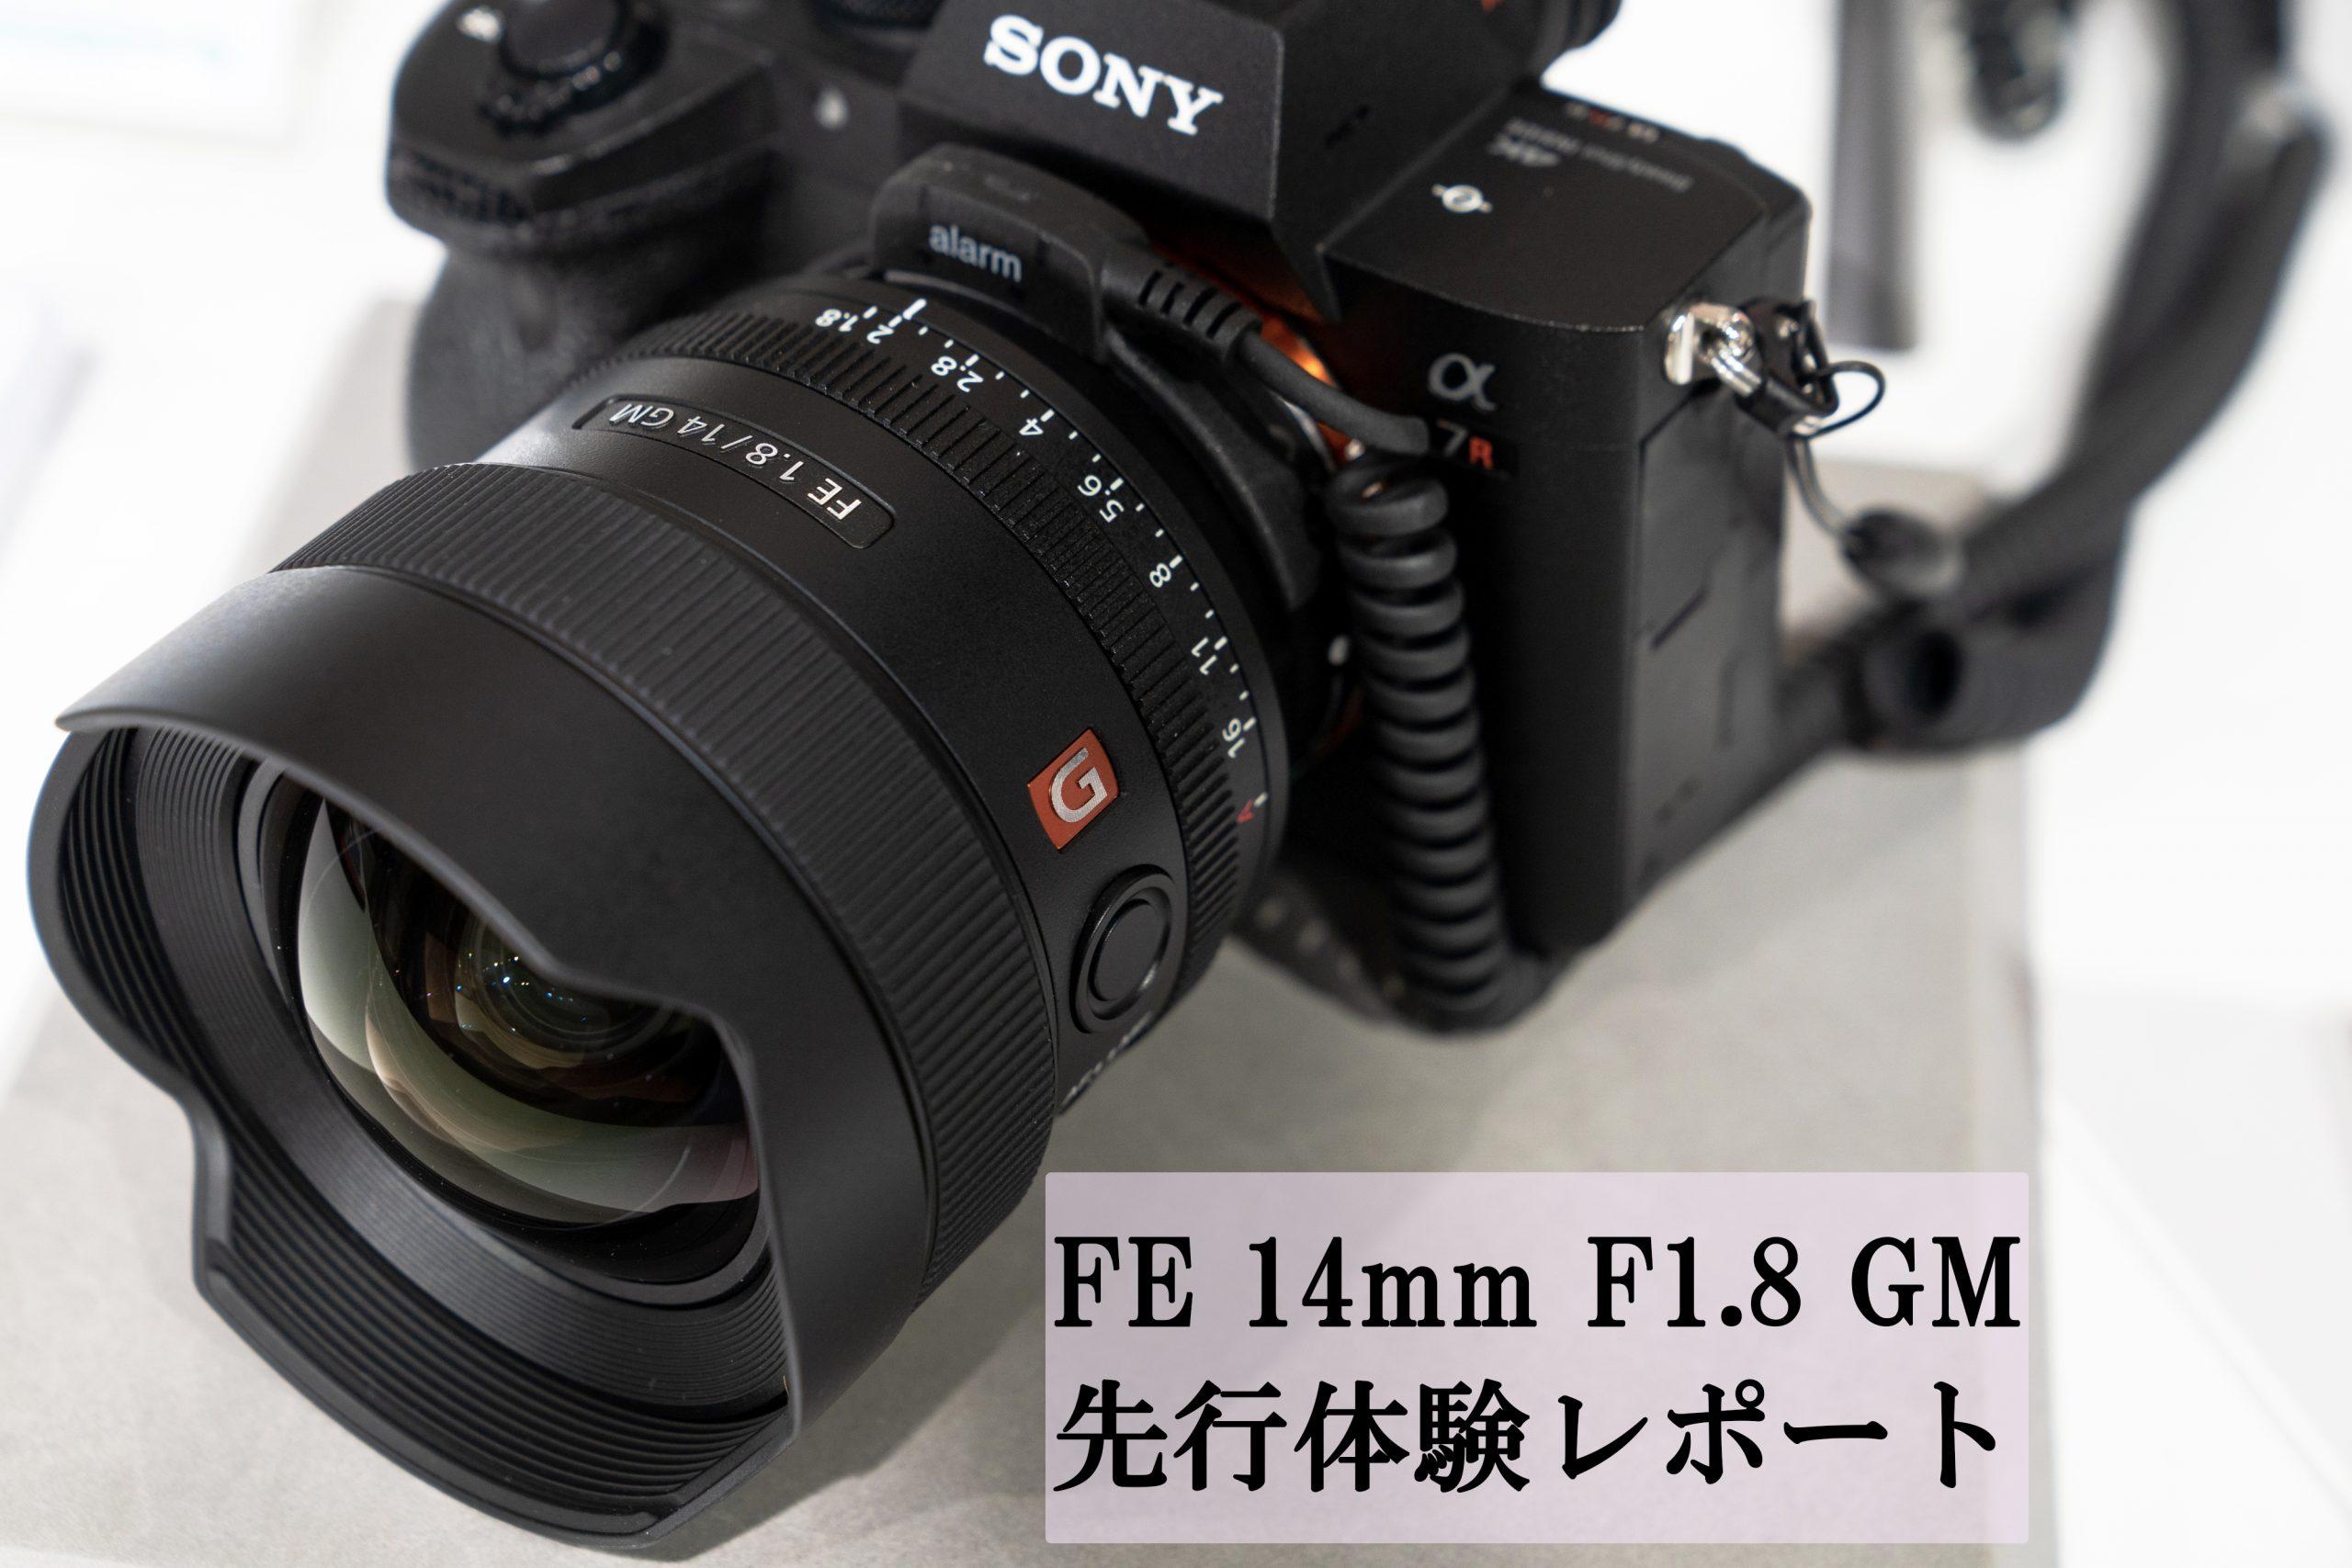 【SONY】FE 14mm F1.8 GM 先行展示 体験レポート